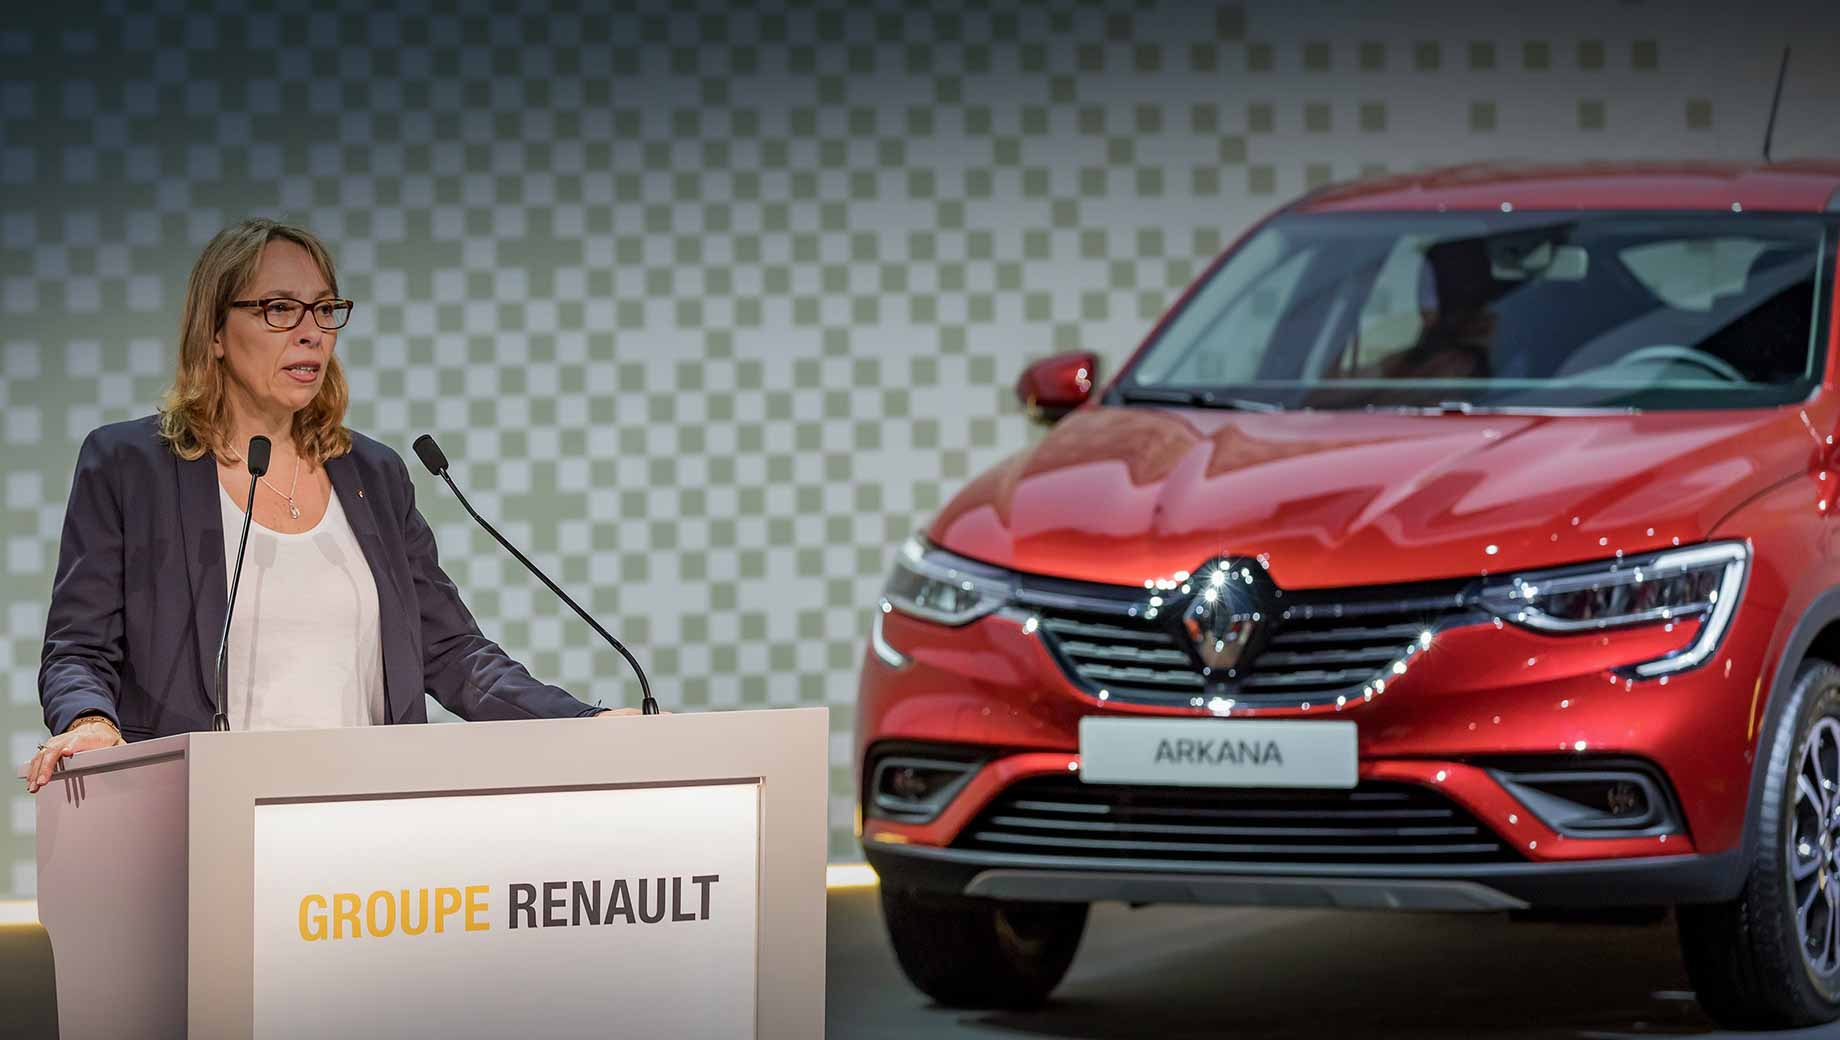 Renault Group объявила о плане по снижению затрат